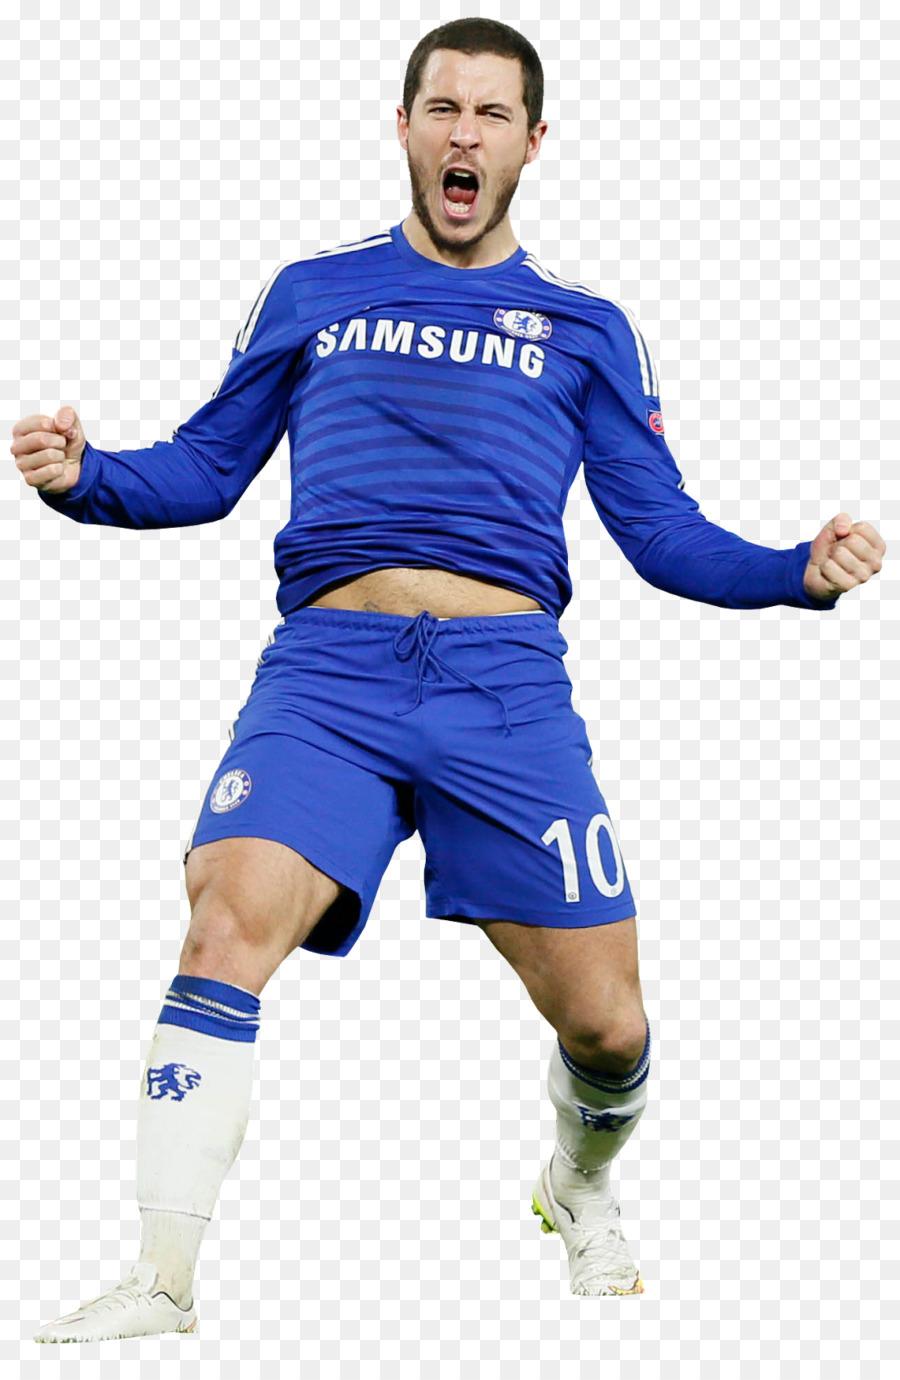 b77e95a3c Eden Hazard Chelsea F.C. Belgium national football team Soccer player  Football player - football png download - 1057 1600 - Free Transparent Eden  Hazard png ...